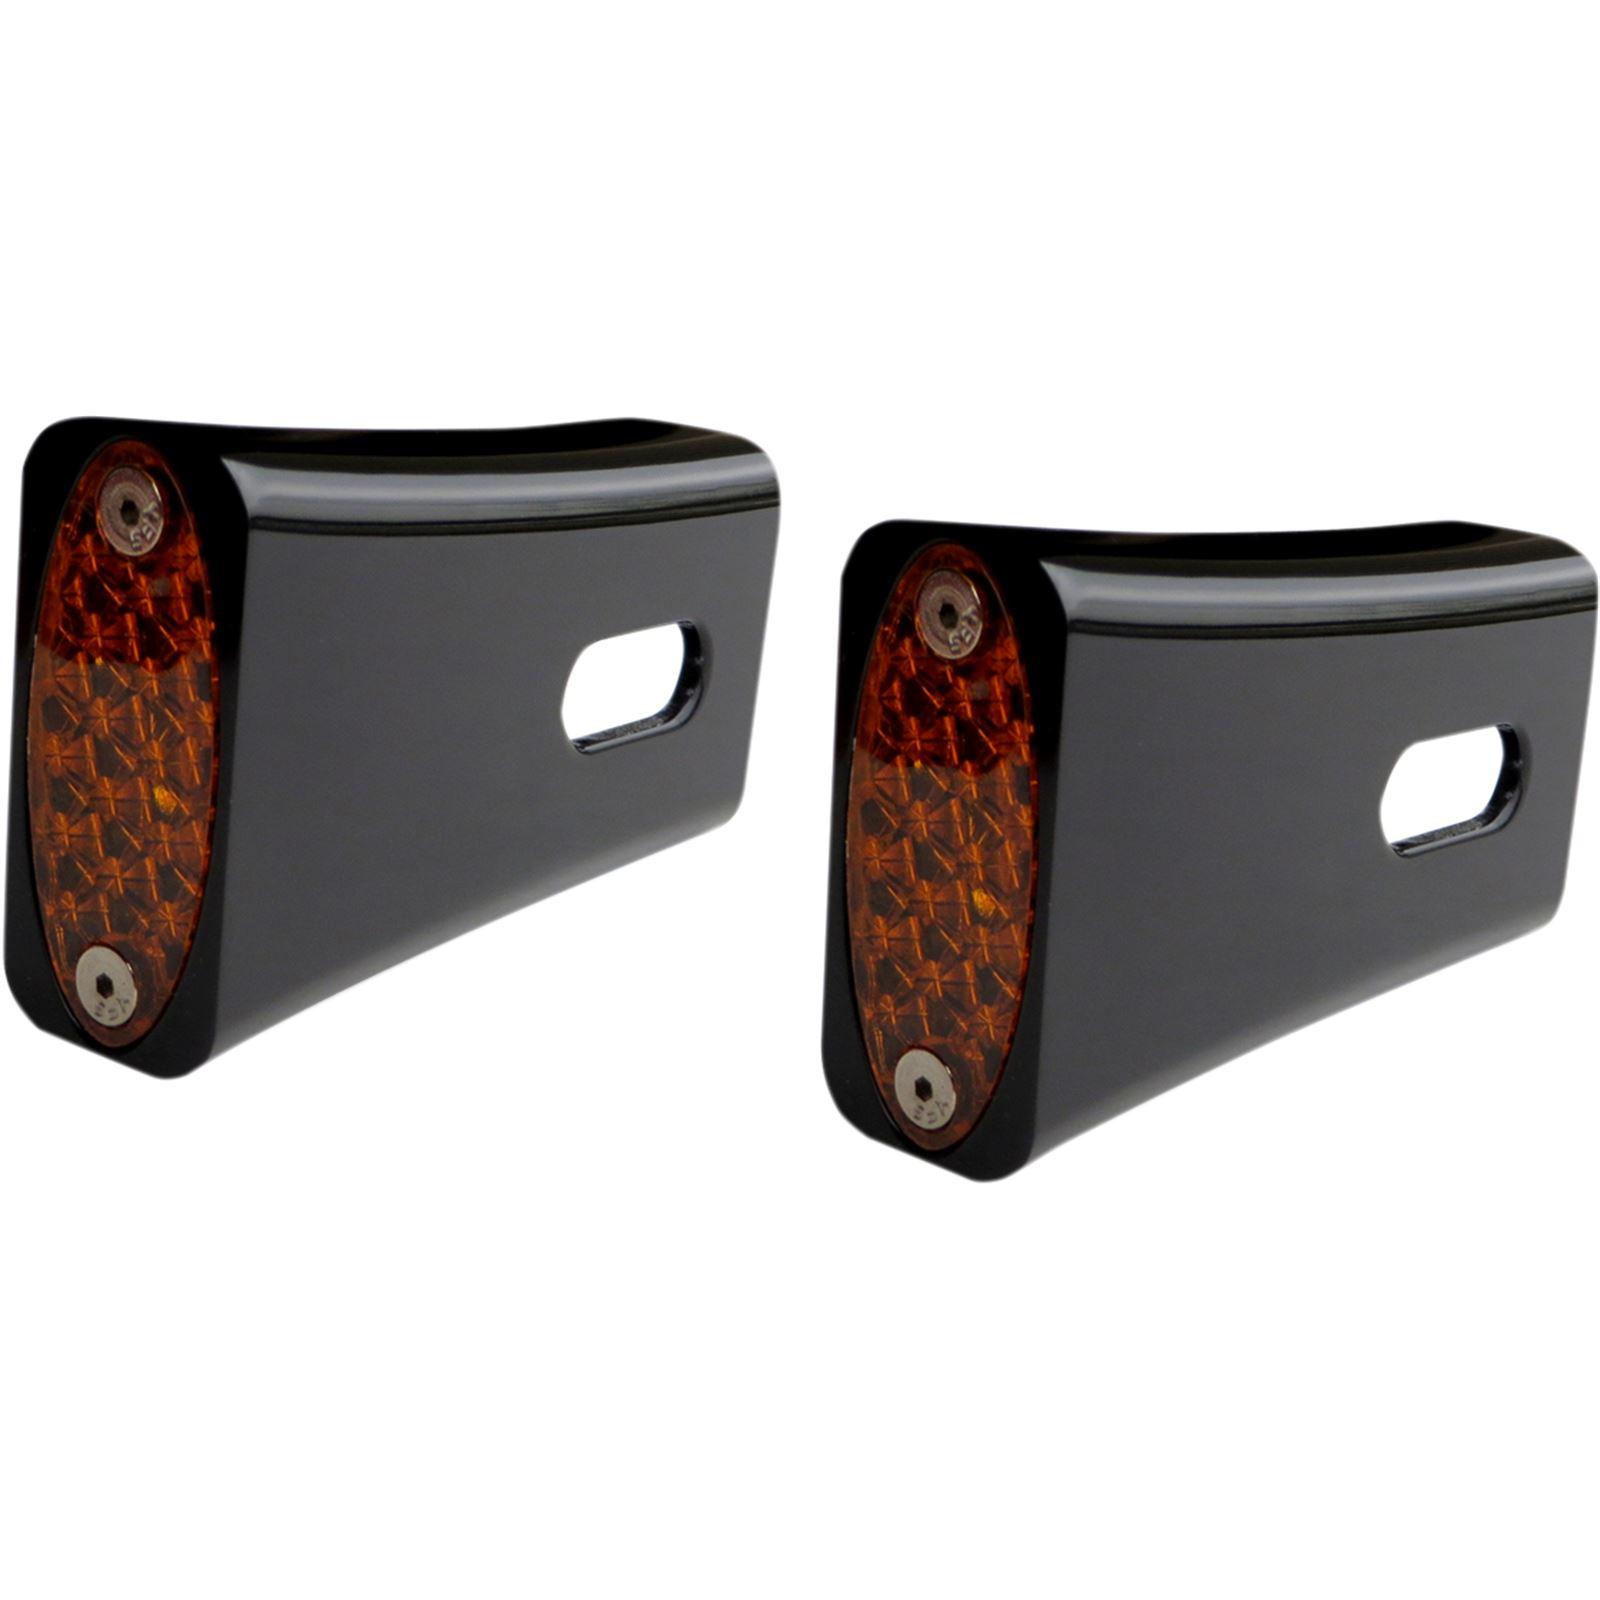 Pro-One Performance Strut LED Marker Light - Black/Amber